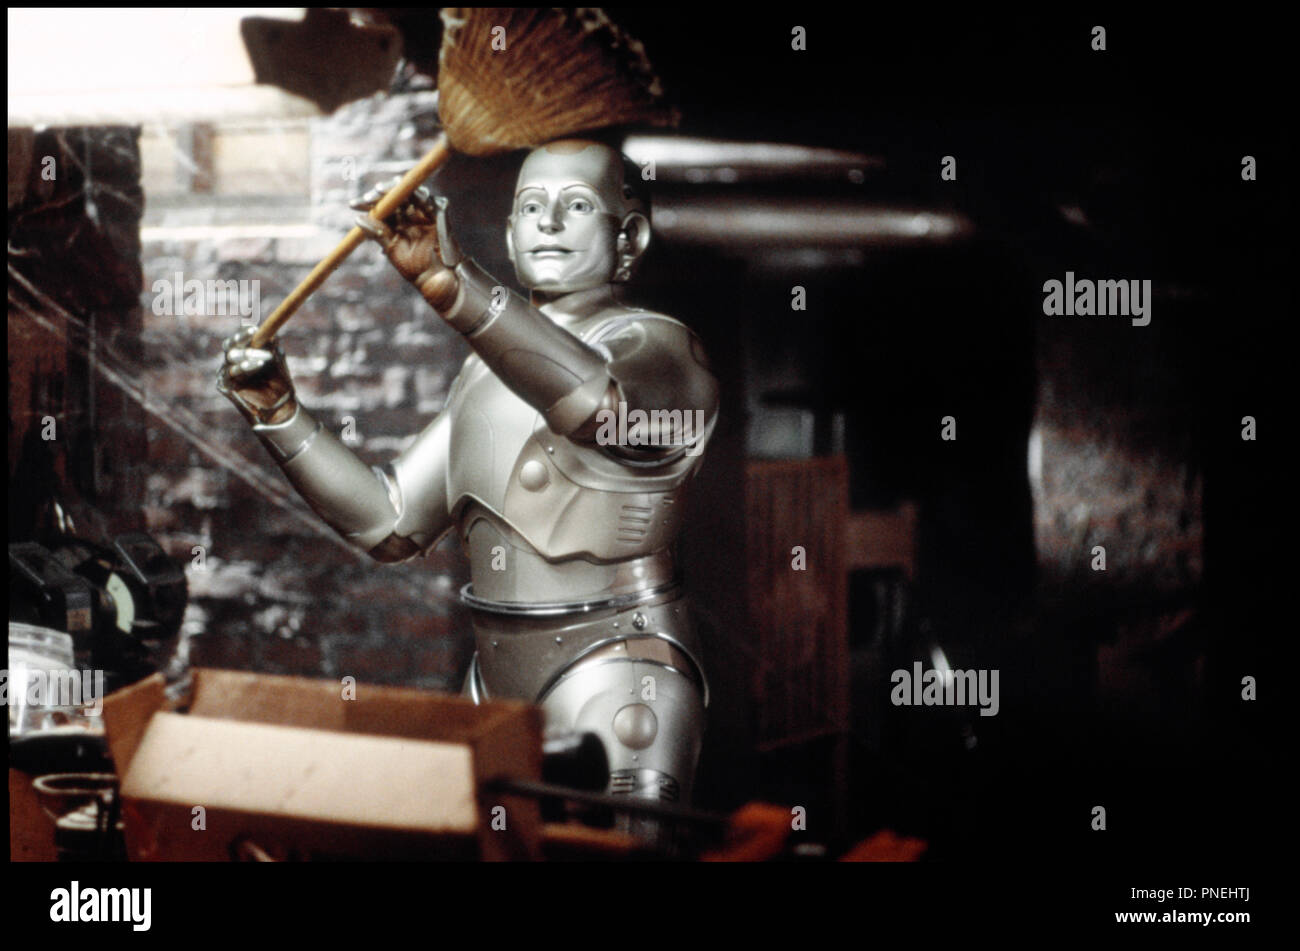 Prod DB © Columbia / DR L'HOMME BICENTENAIRE (BICENTENNIAL MAN) de Chris Columbus 1999 USA avec Robin Williams robots,  d'apres le roman de Isaac Asimov - Stock Image